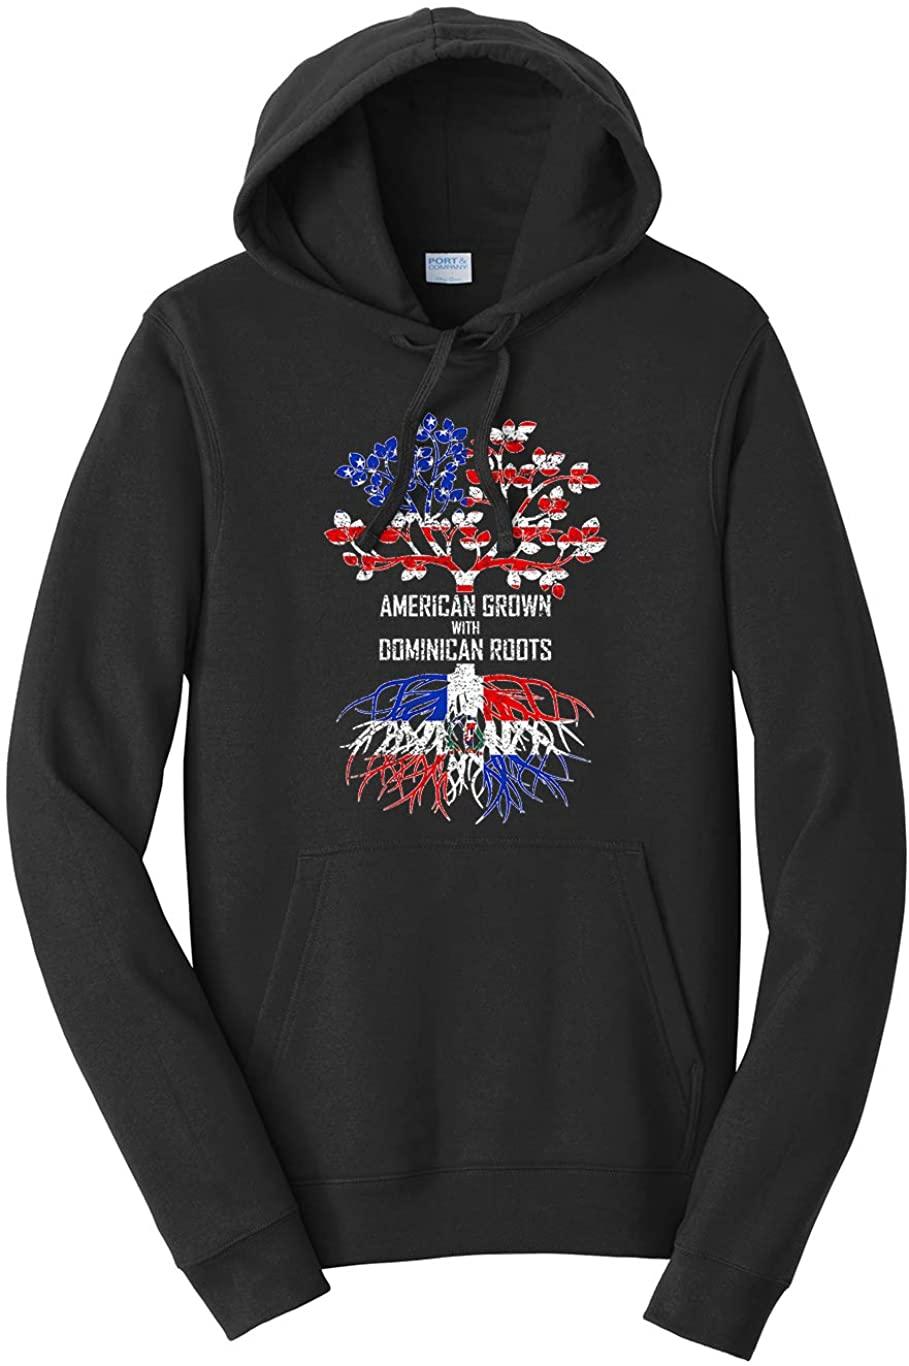 Tenacitee Unisex American Grown with Dominican Roots, Dominican Republic Hooded Sweatshirt